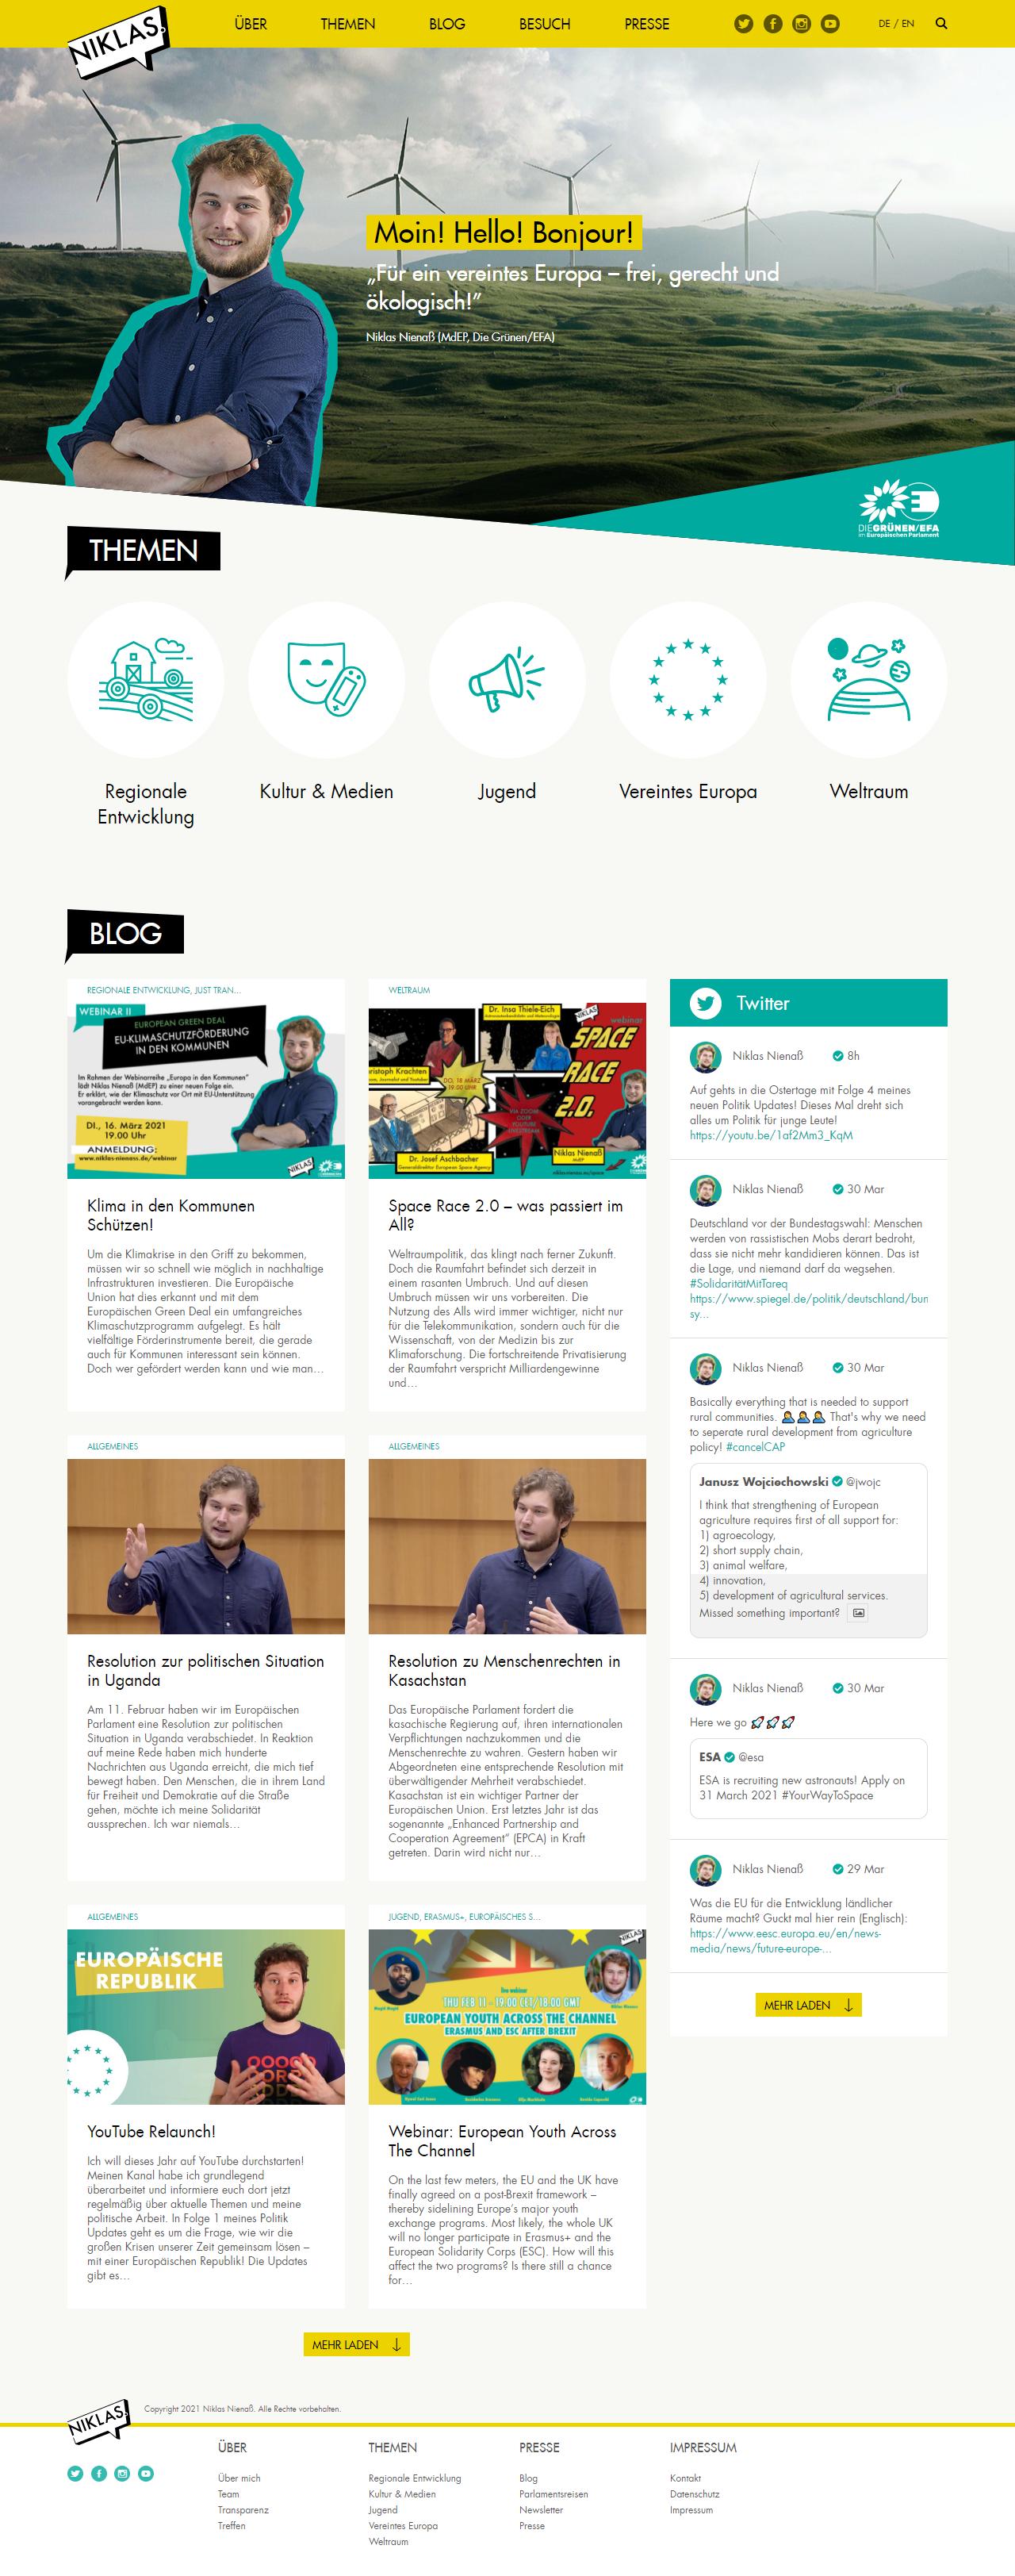 Niklas Nienass website screenshot